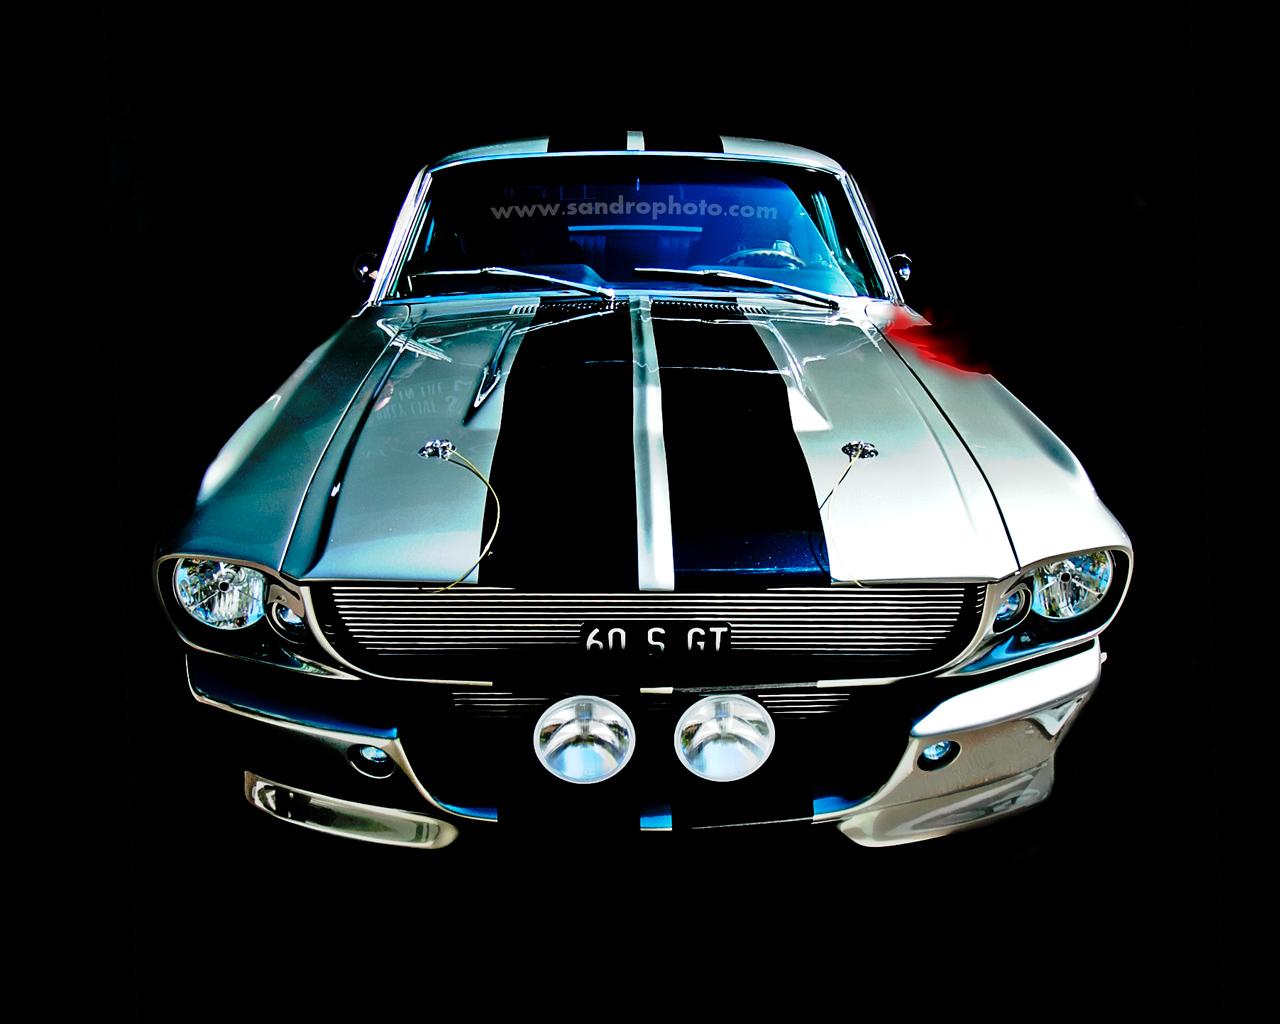 http://2.bp.blogspot.com/_1gioWqn_ewM/TAeOu87VsaI/AAAAAAAAABw/z7hgU9M46oU/s1600/muscle-car-wallpaper-mustang-60s-gt-1280x1024.jpg